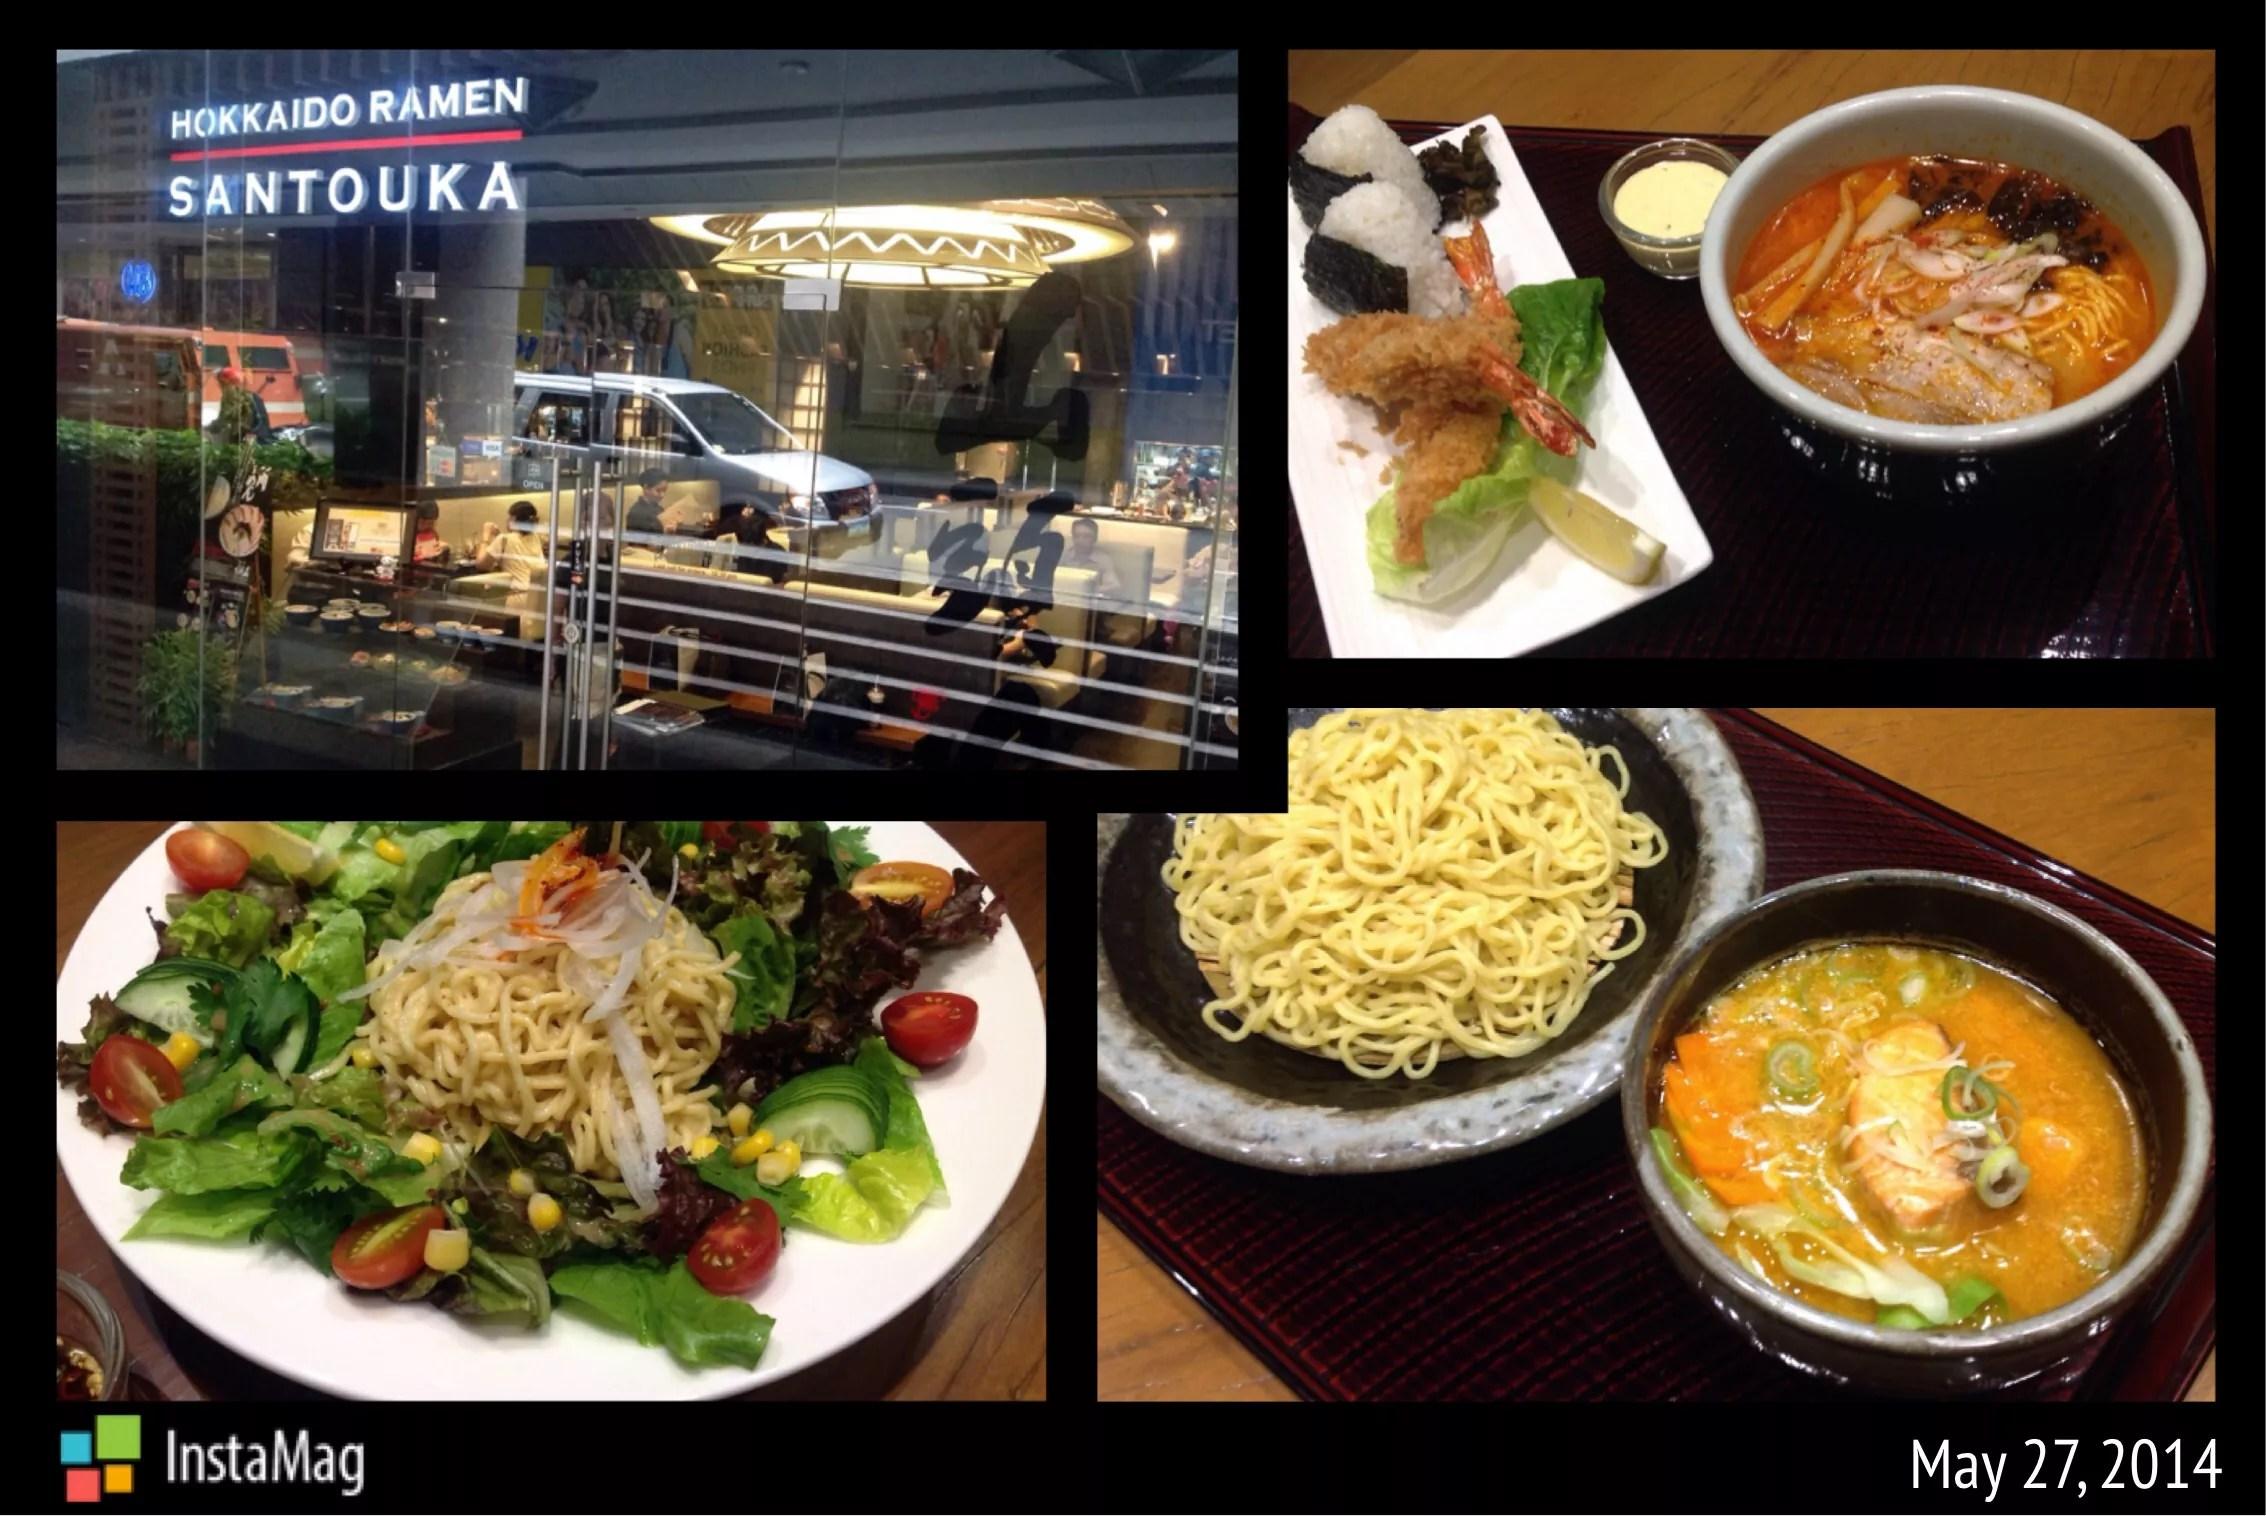 New dishes at Hokkaido Ramen Santouka